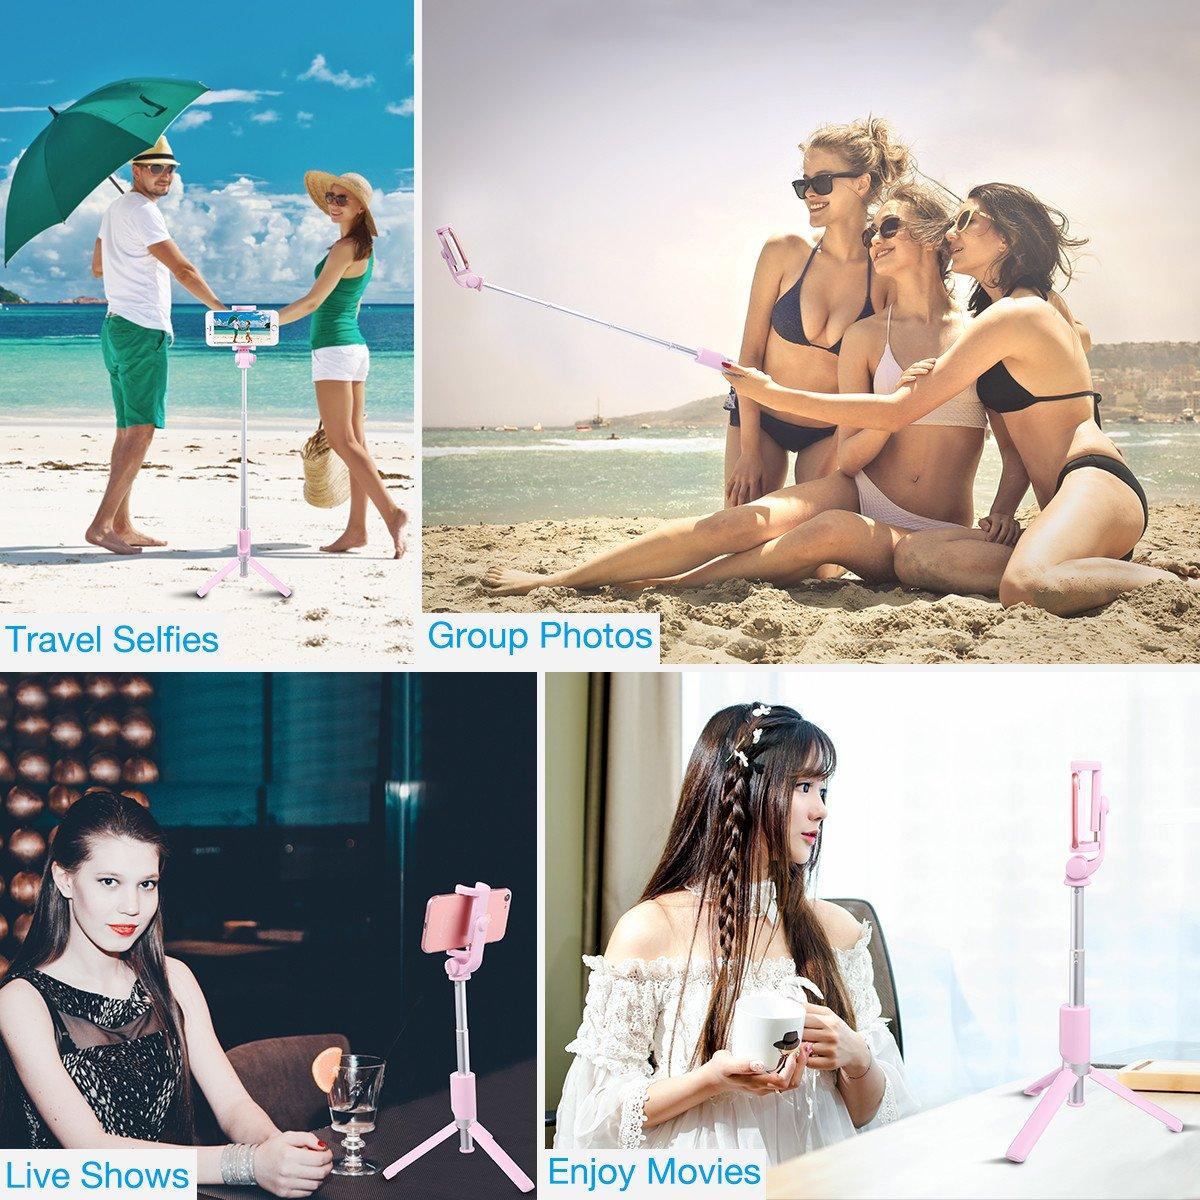 Selfie Stick Tripod,Poweradd Extendable/Foldable Aluminum Selfie Stick with Detachable/Wireless Remote for iPhone X/SE/6/6s/6 Plus/7/7 Plus/8/8 Plus/,Samsung 8/S8/S8 Plus,Nexus,LG,Moto and More-Pink by POWERADD (Image #8)